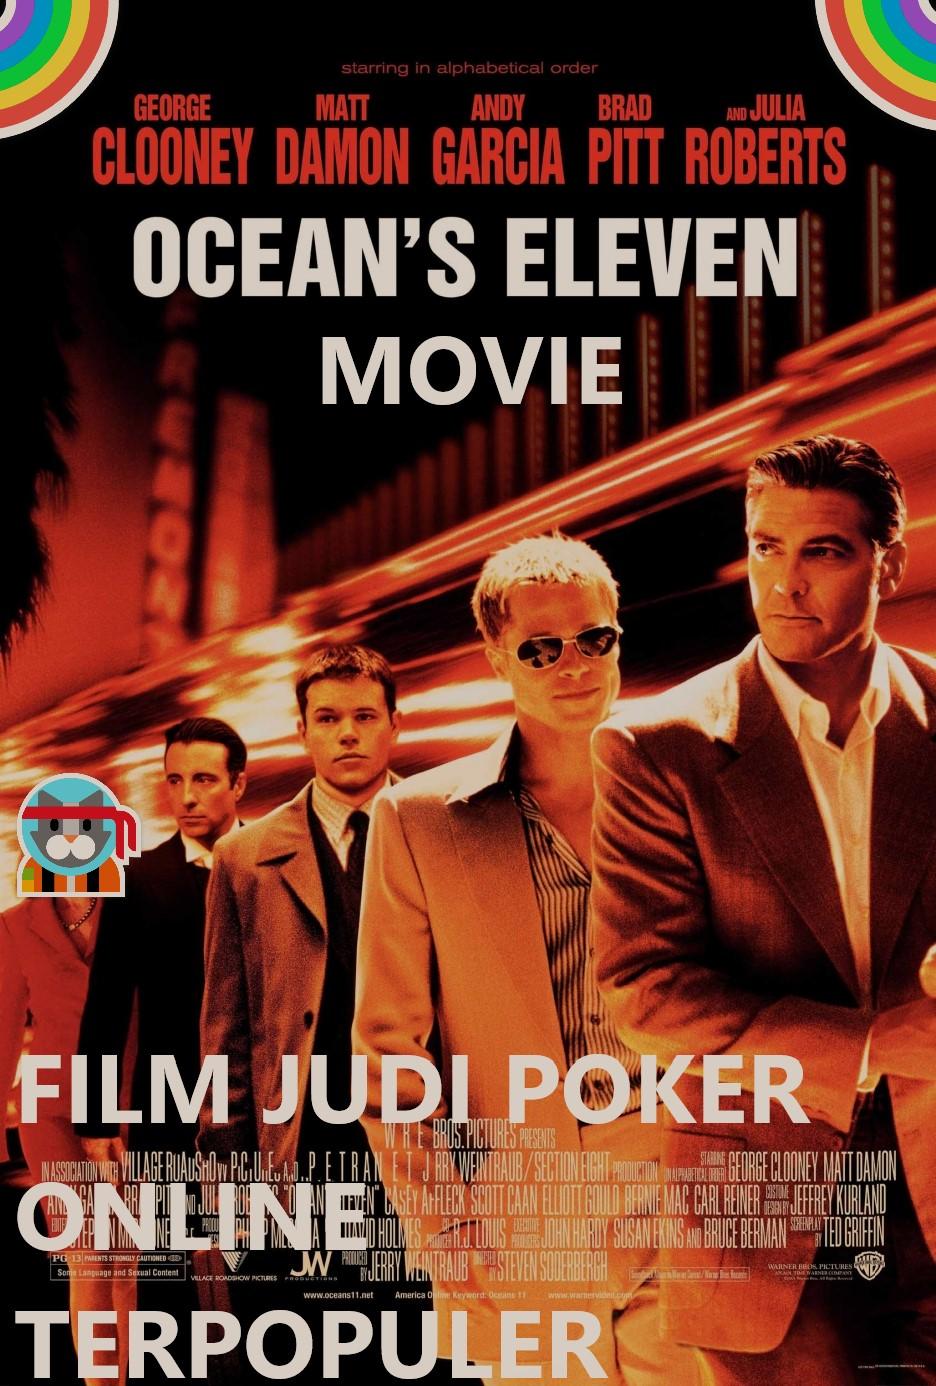 Film Judi Poker Ocean Eleven